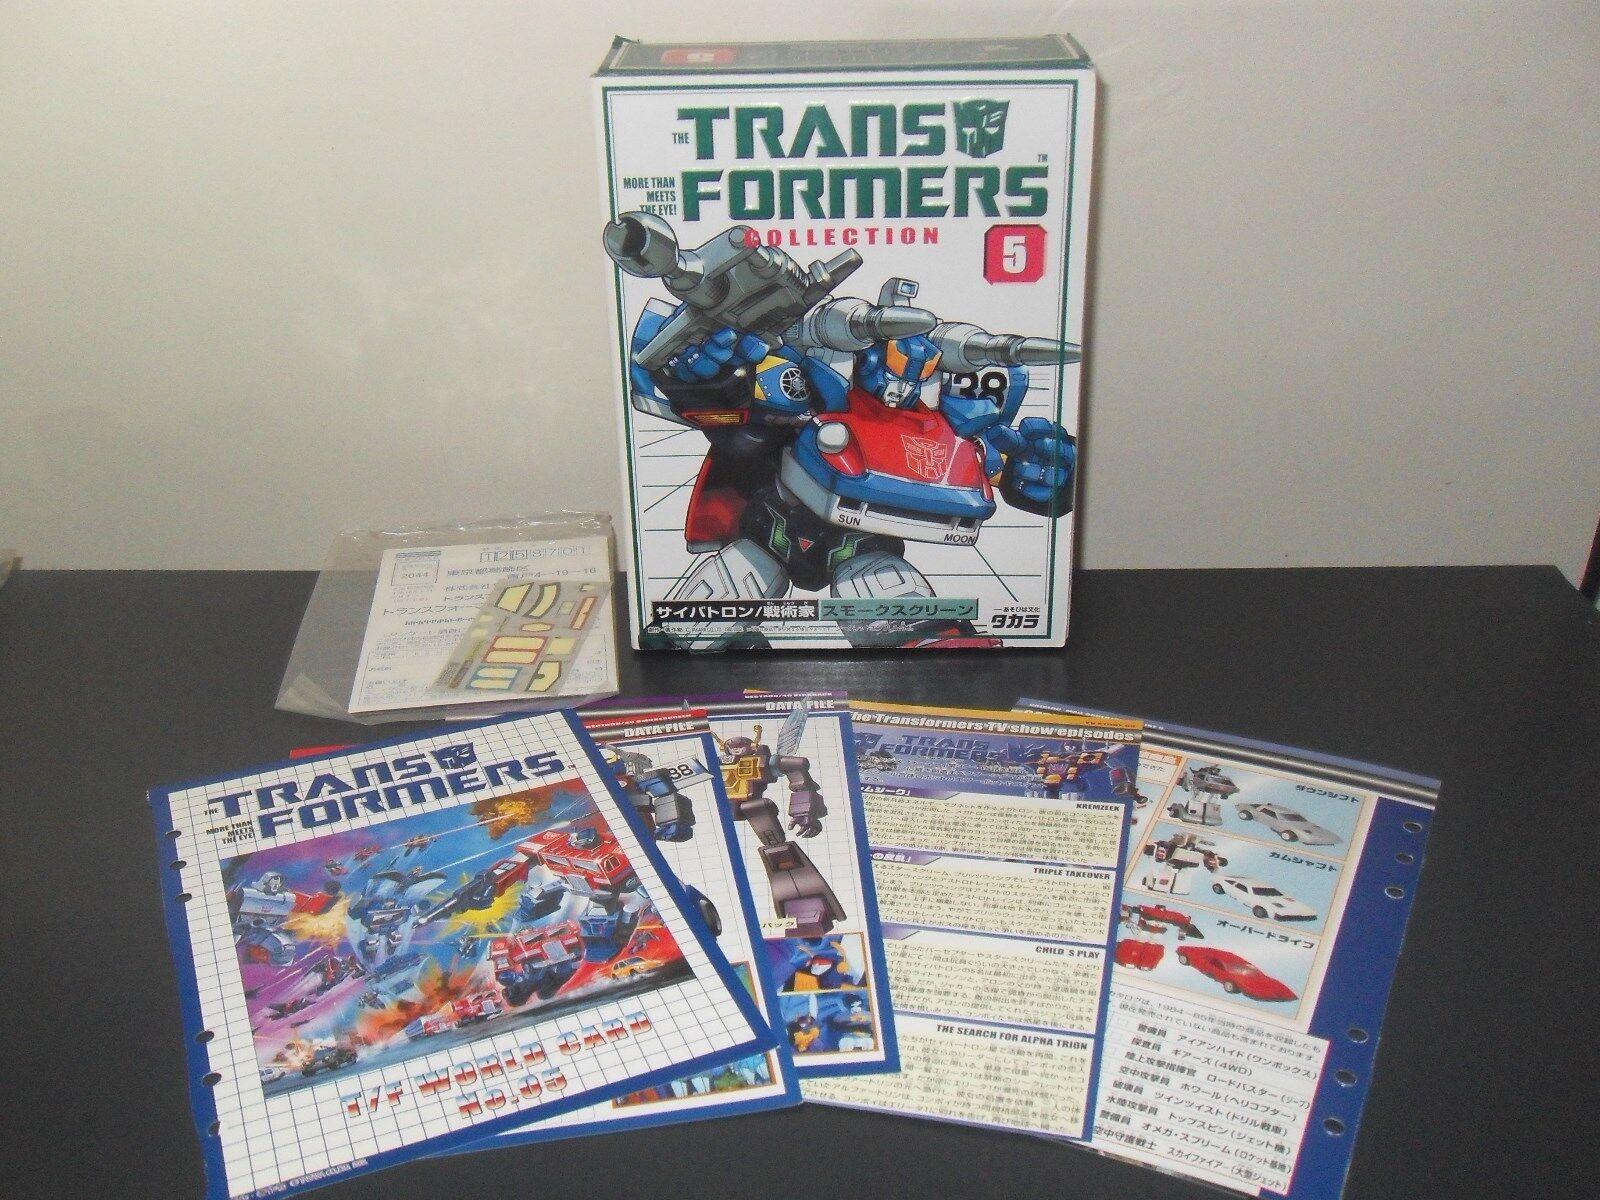 G1 transformers neuauflage takara sammlung 5 nebelwand, minze